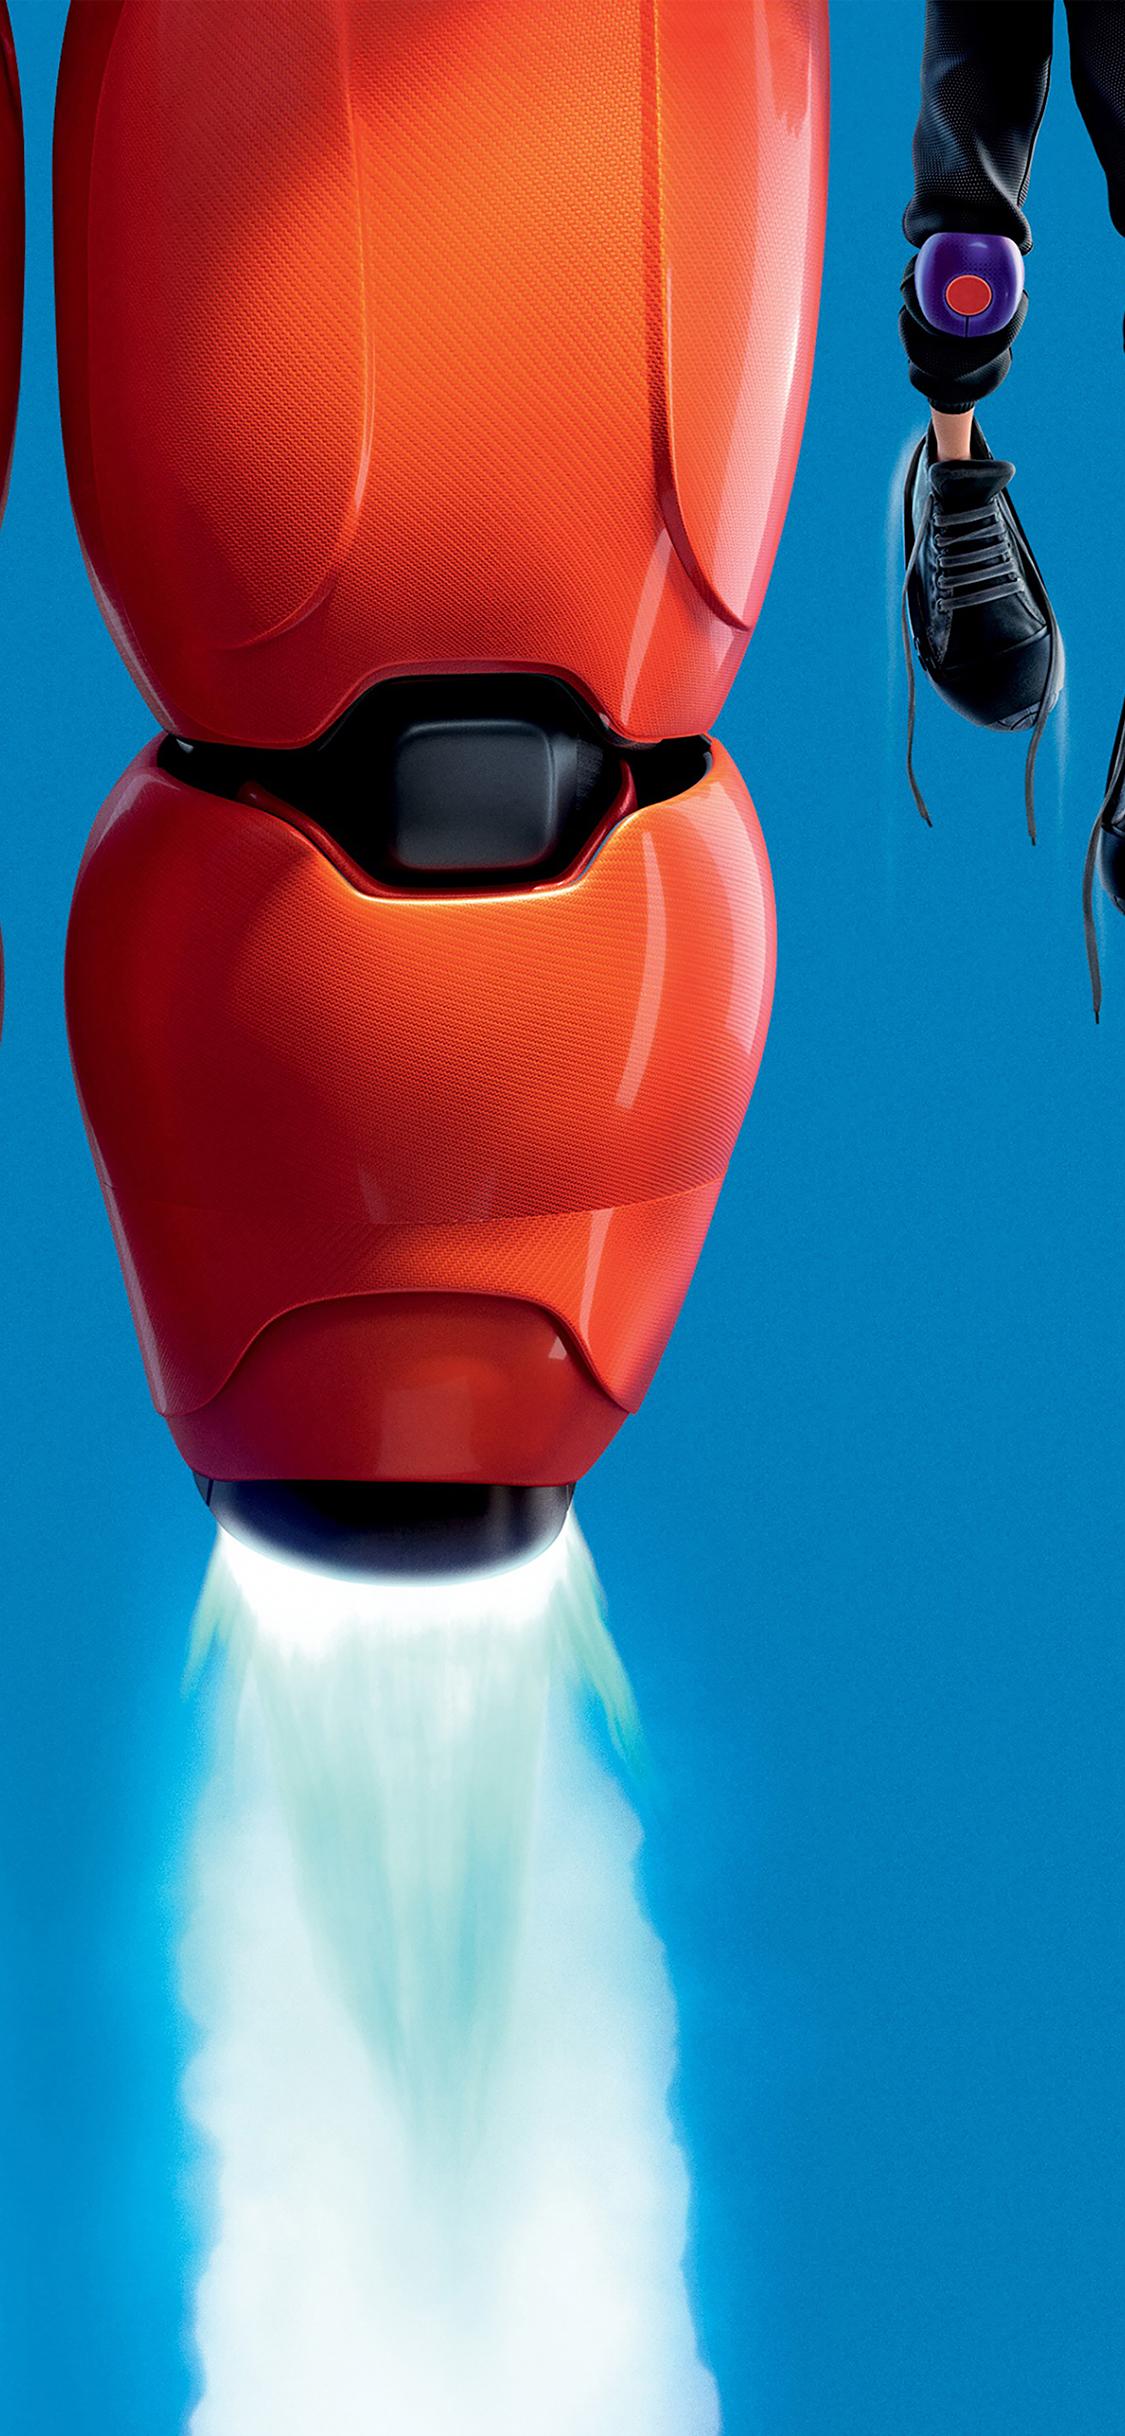 Iphonexpapers Af87 Big Hero 6 Fly Disney Art Illust